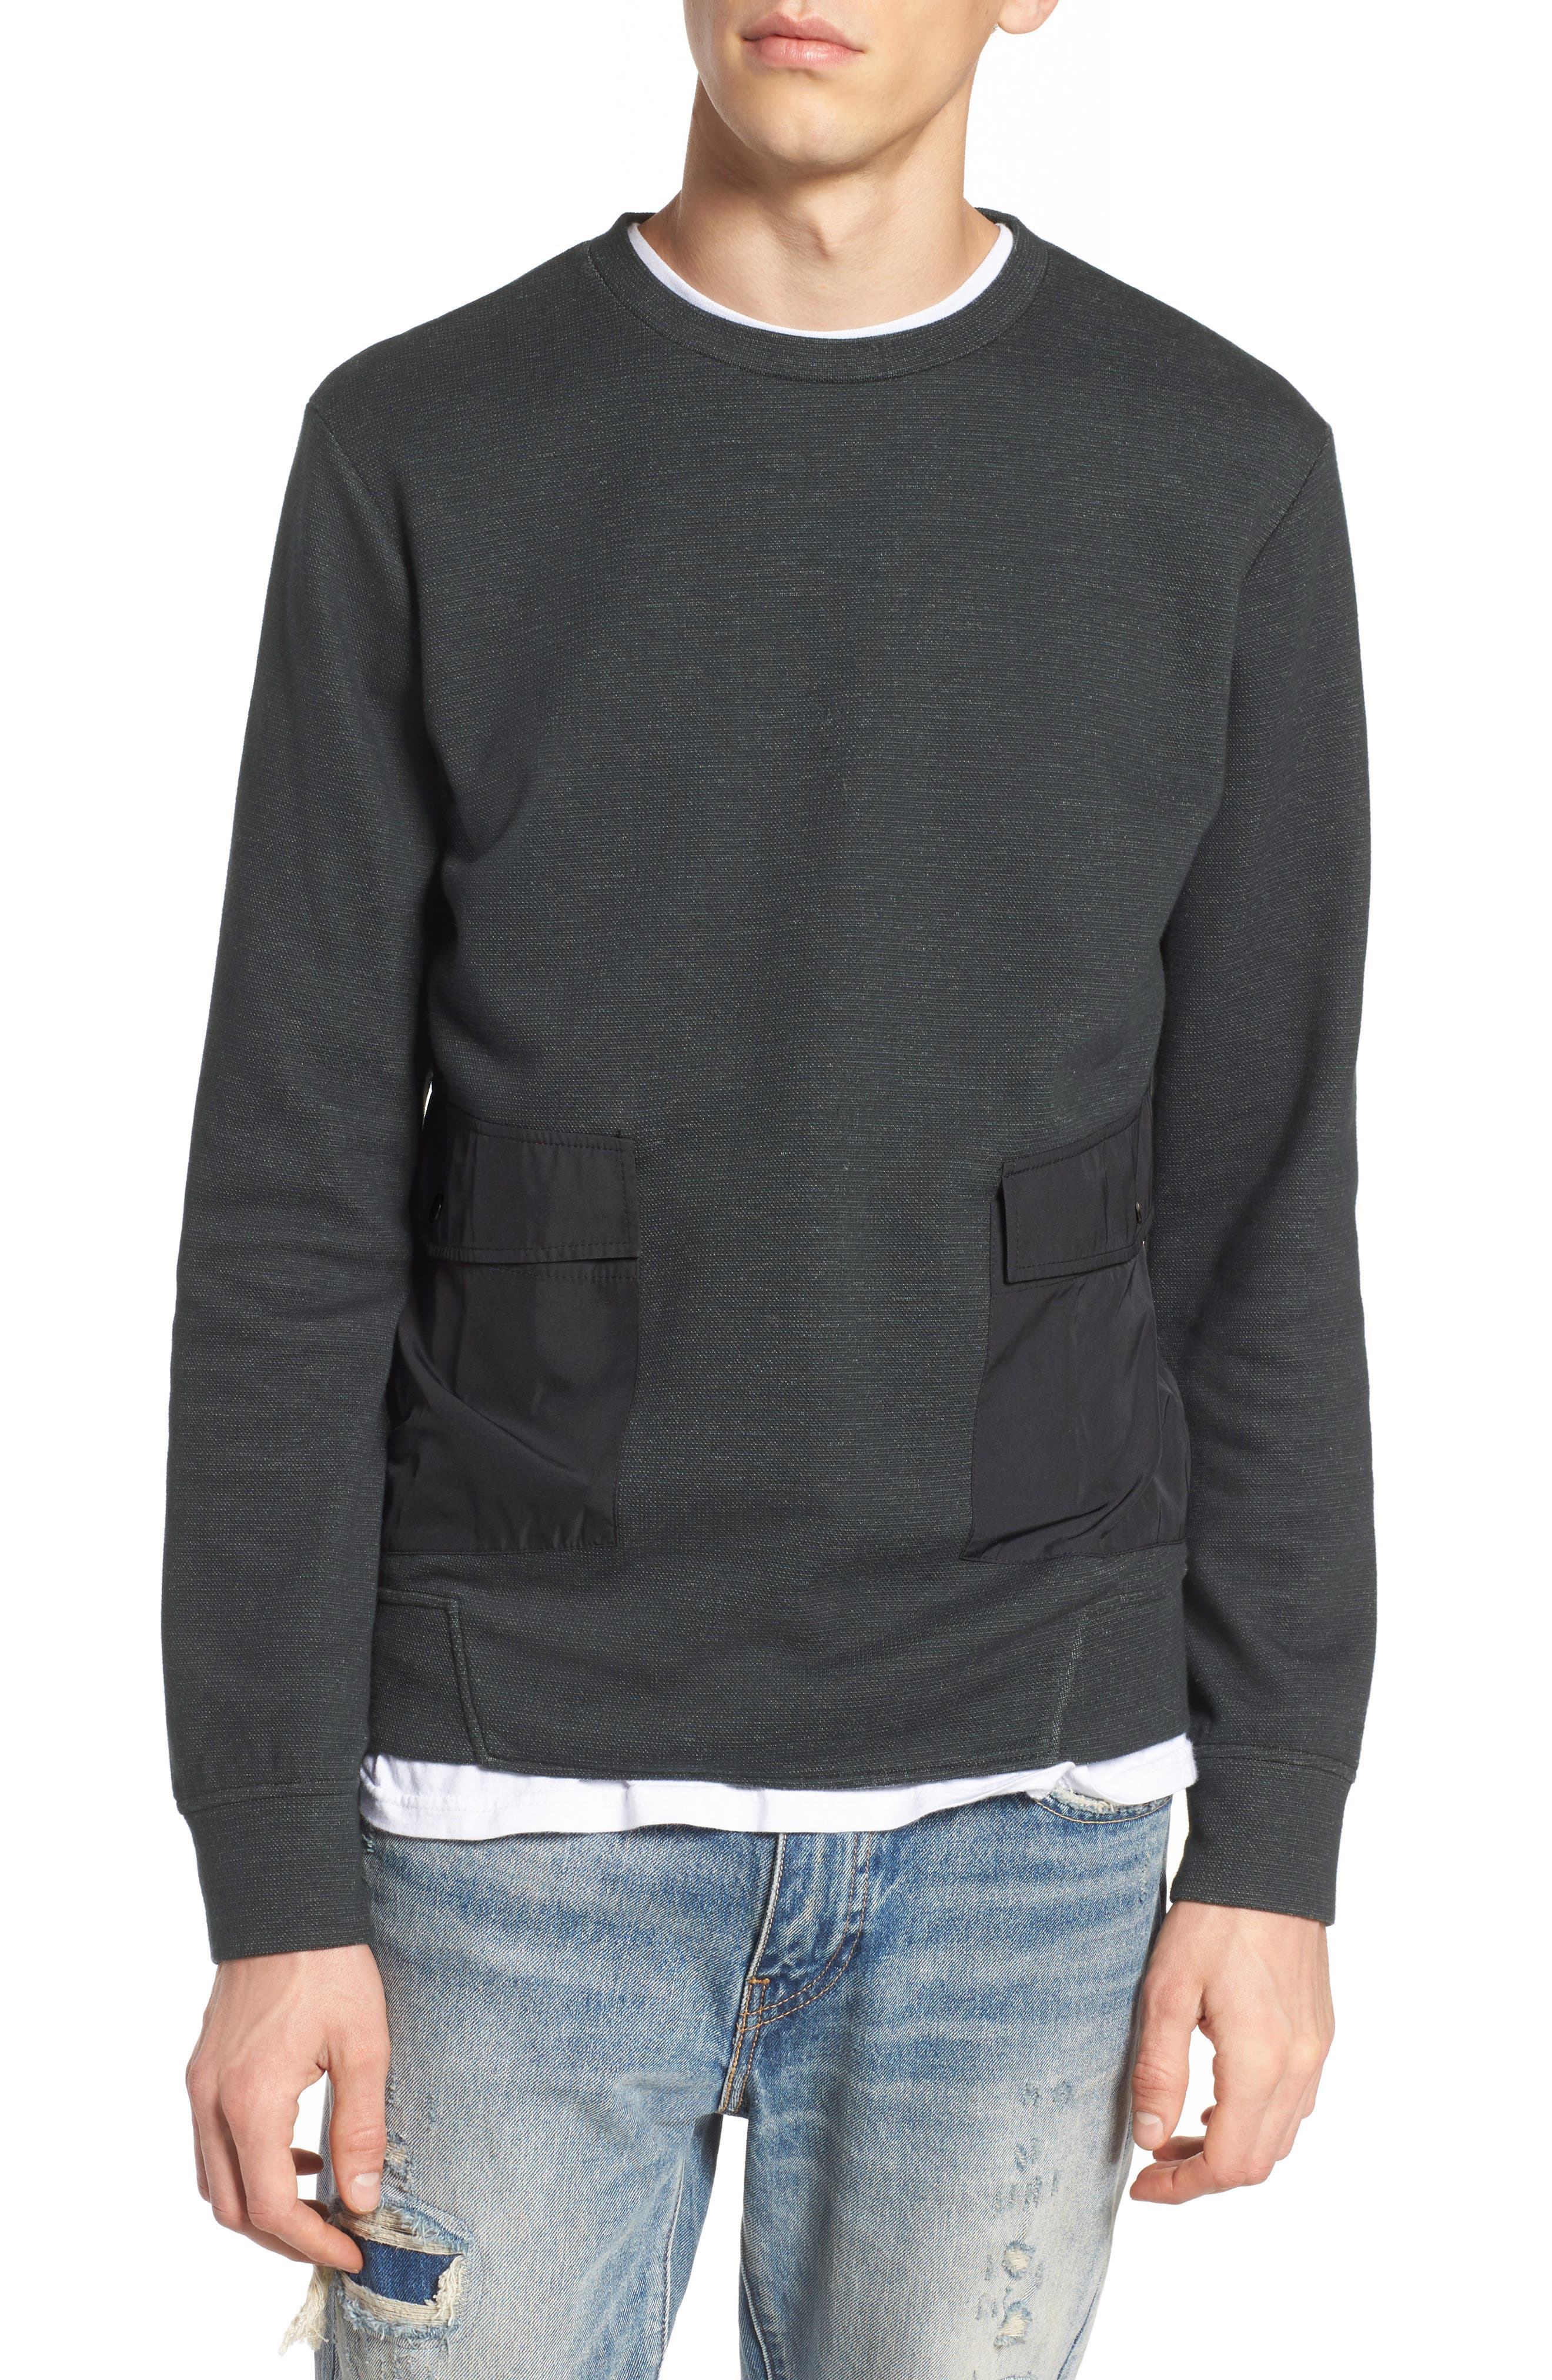 Oracle Sweatshirt,                             Main thumbnail 1, color,                             Green